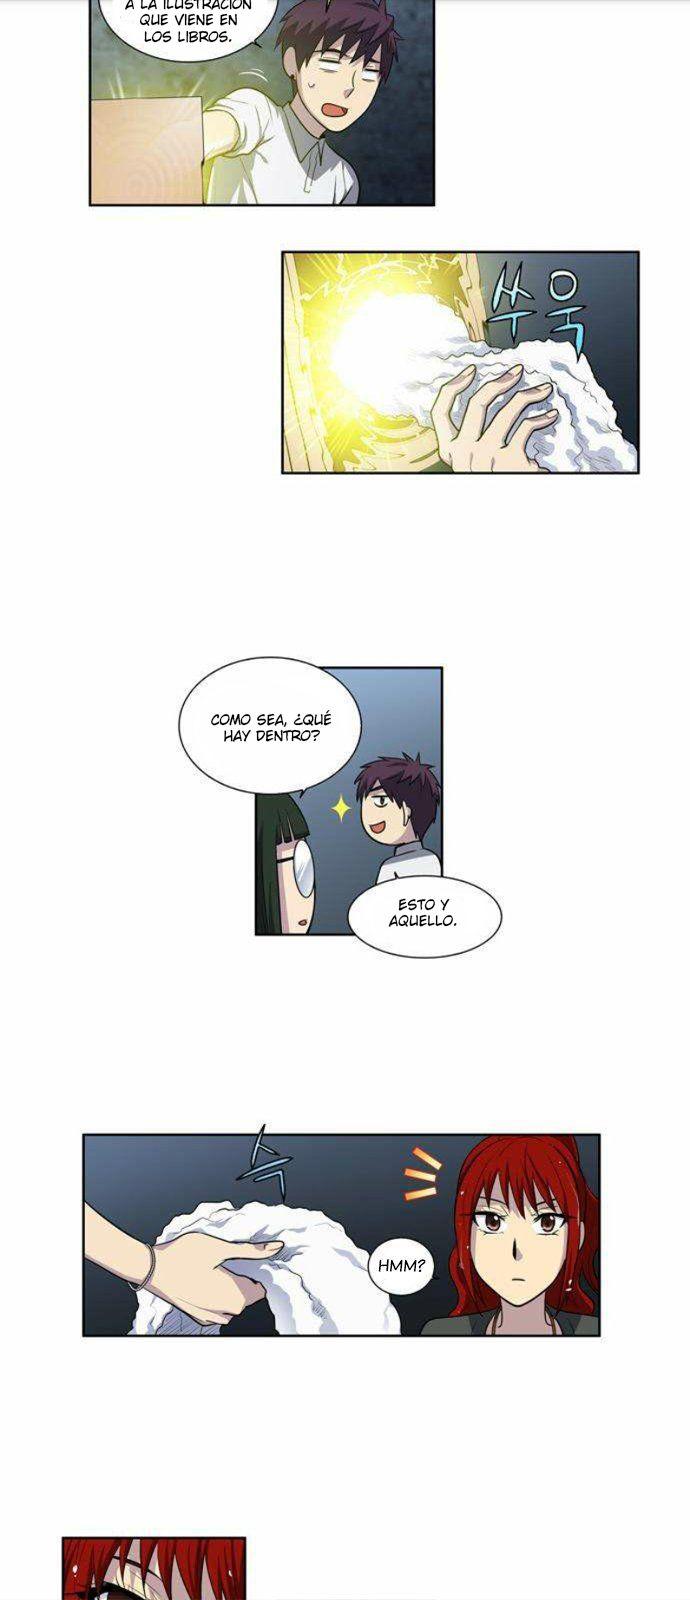 https://c5.ninemanga.com/es_manga/61/1725/487801/d7736cd357677a524f9cfb69d1830516.jpg Page 6